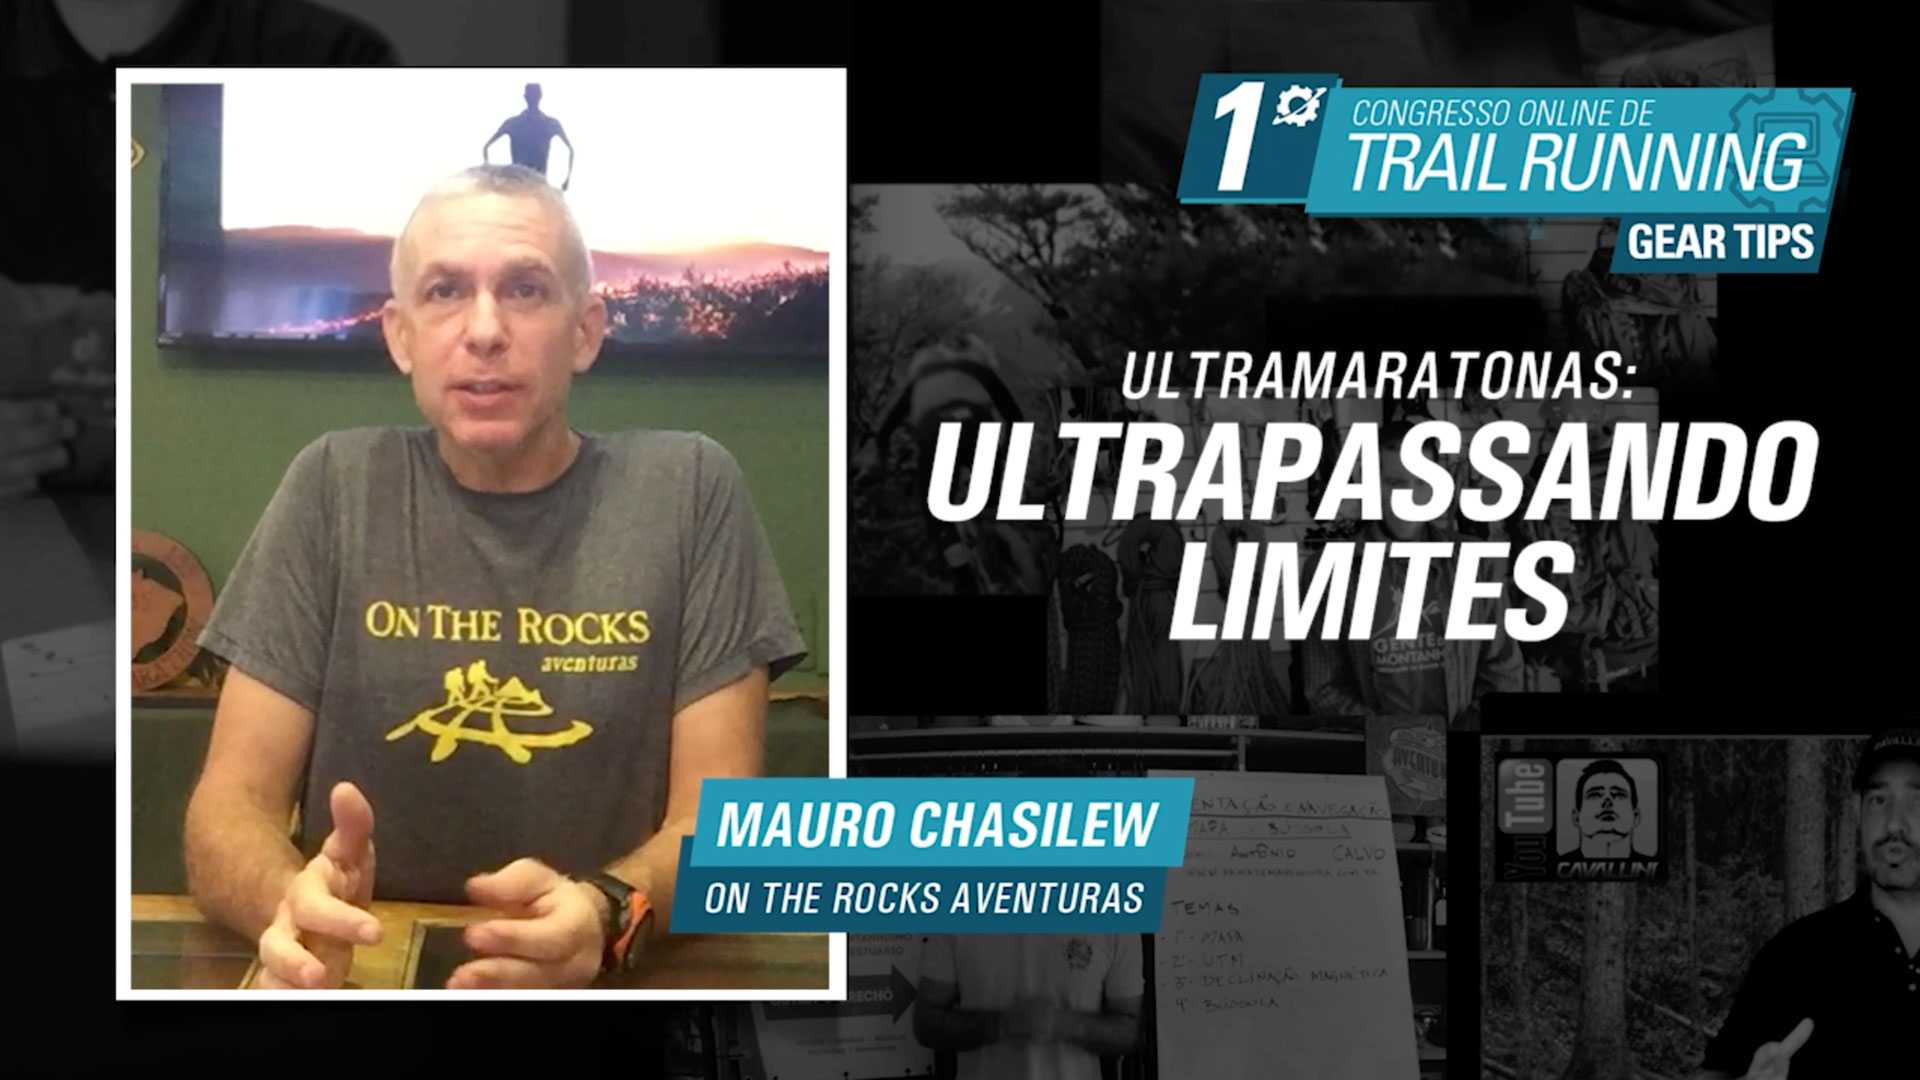 Maratonas Ultrapassando Limites - Mauro Chasilew